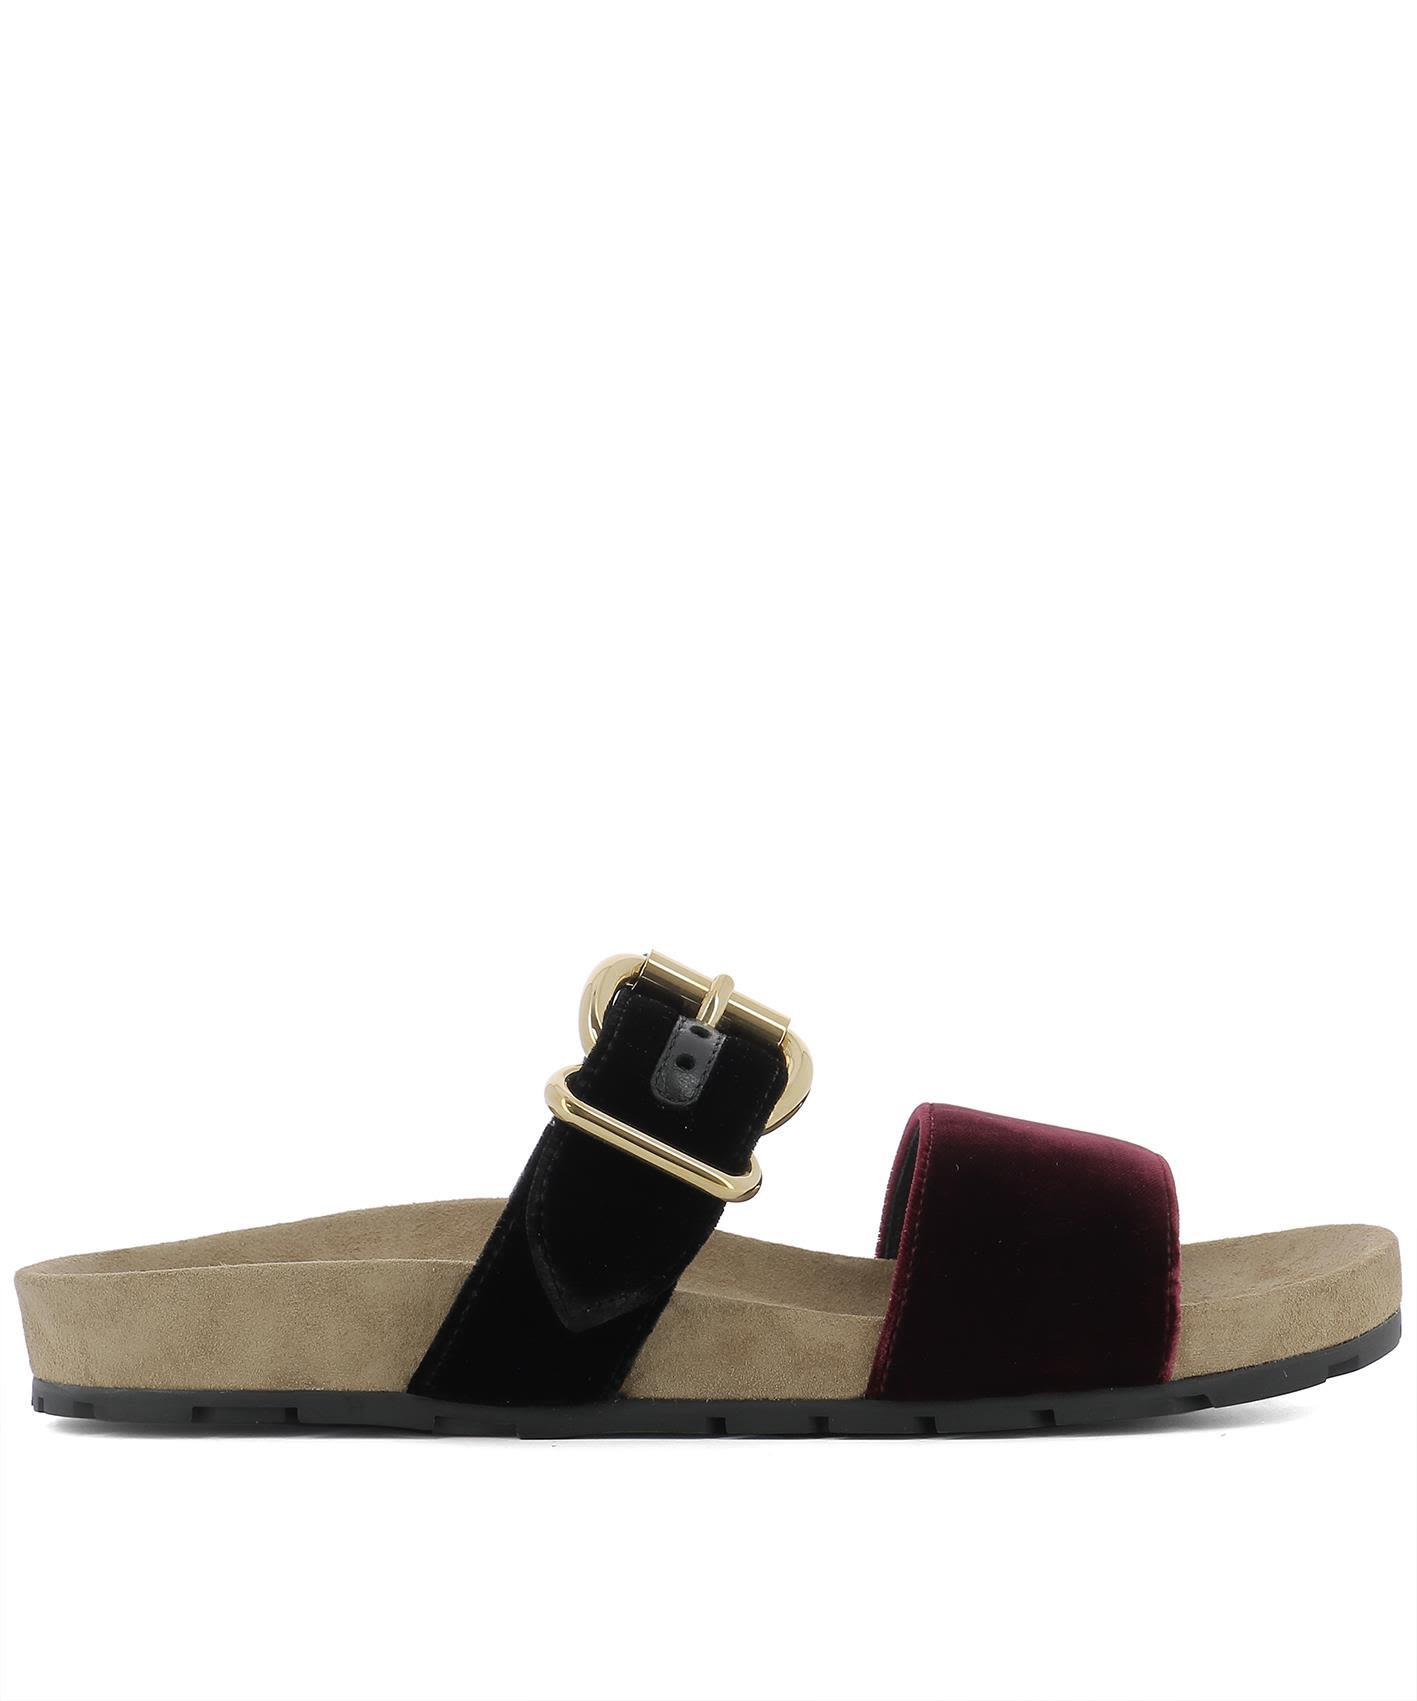 Bordeaux Velvet Sandals